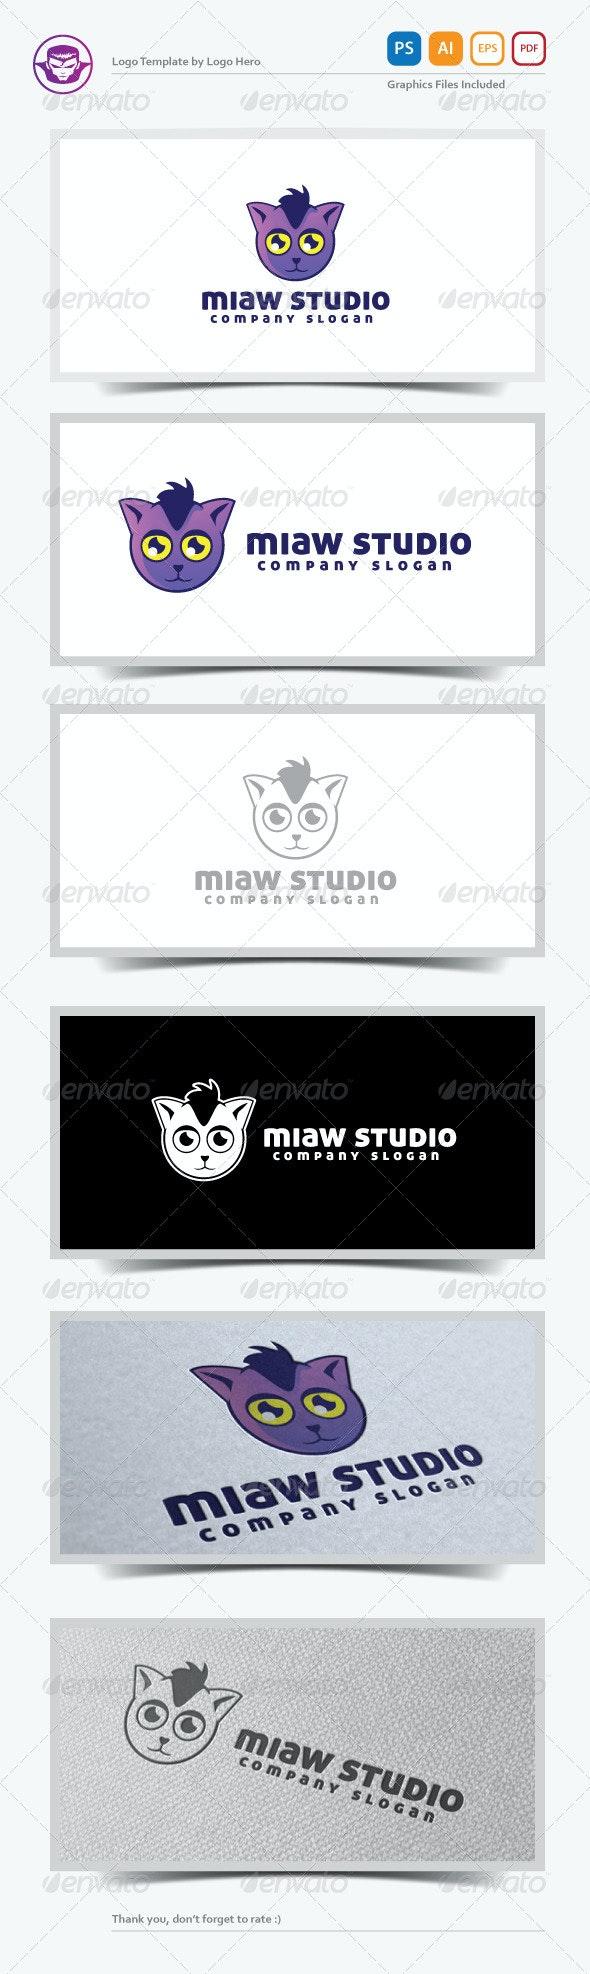 Miaw Studio Logo Template - Animals Logo Templates